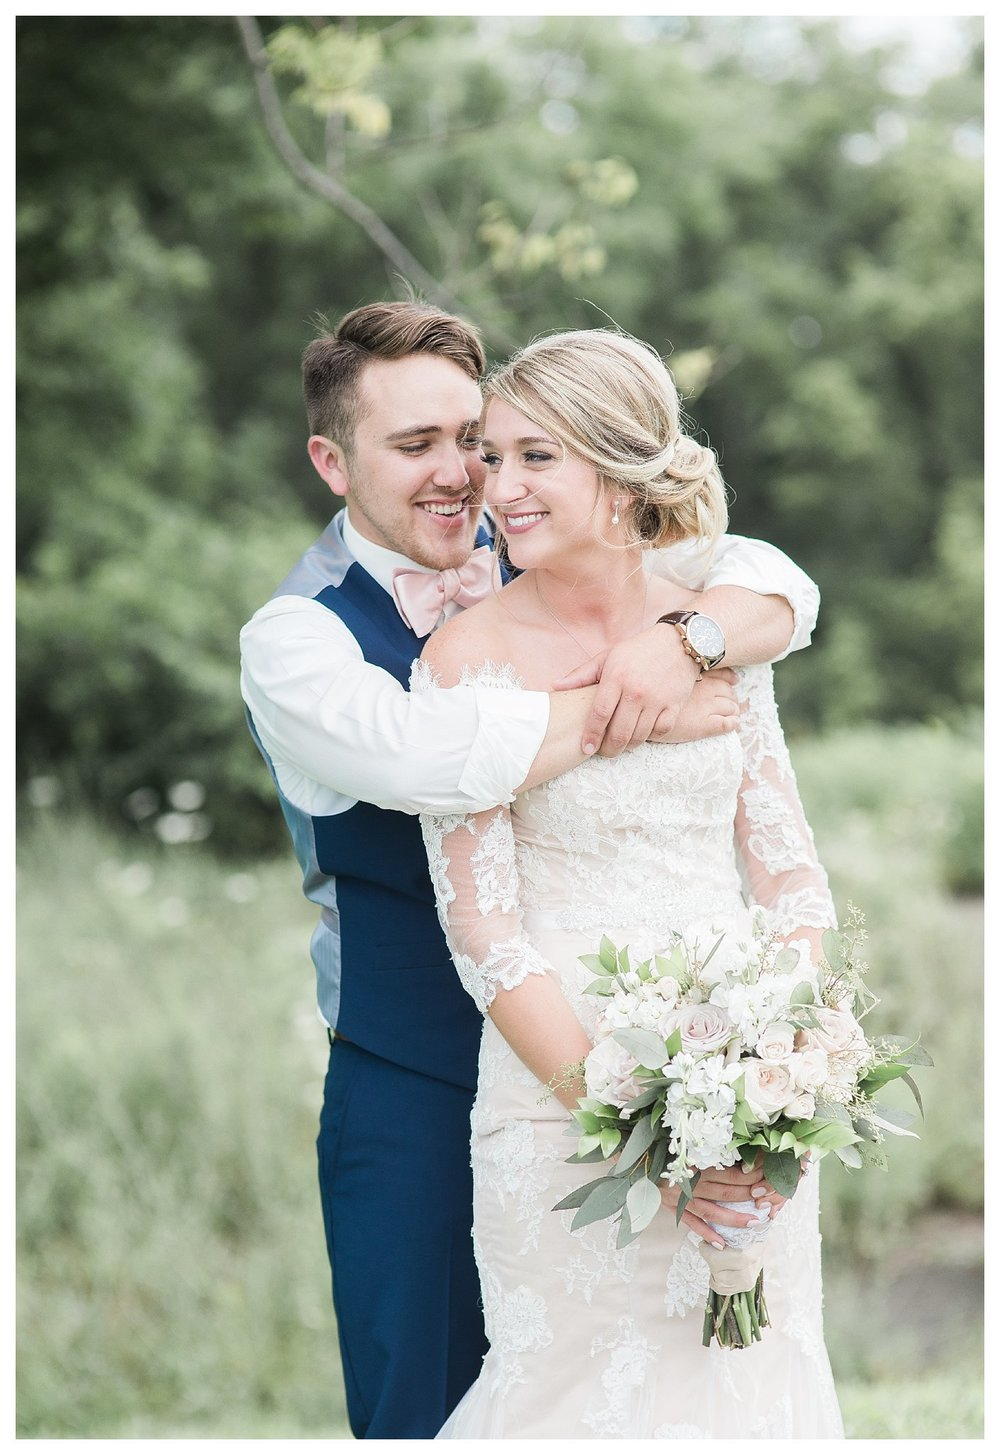 tower-park-mess-hall-everleigh-photography-northern-kentucky-wedding-photographer-23